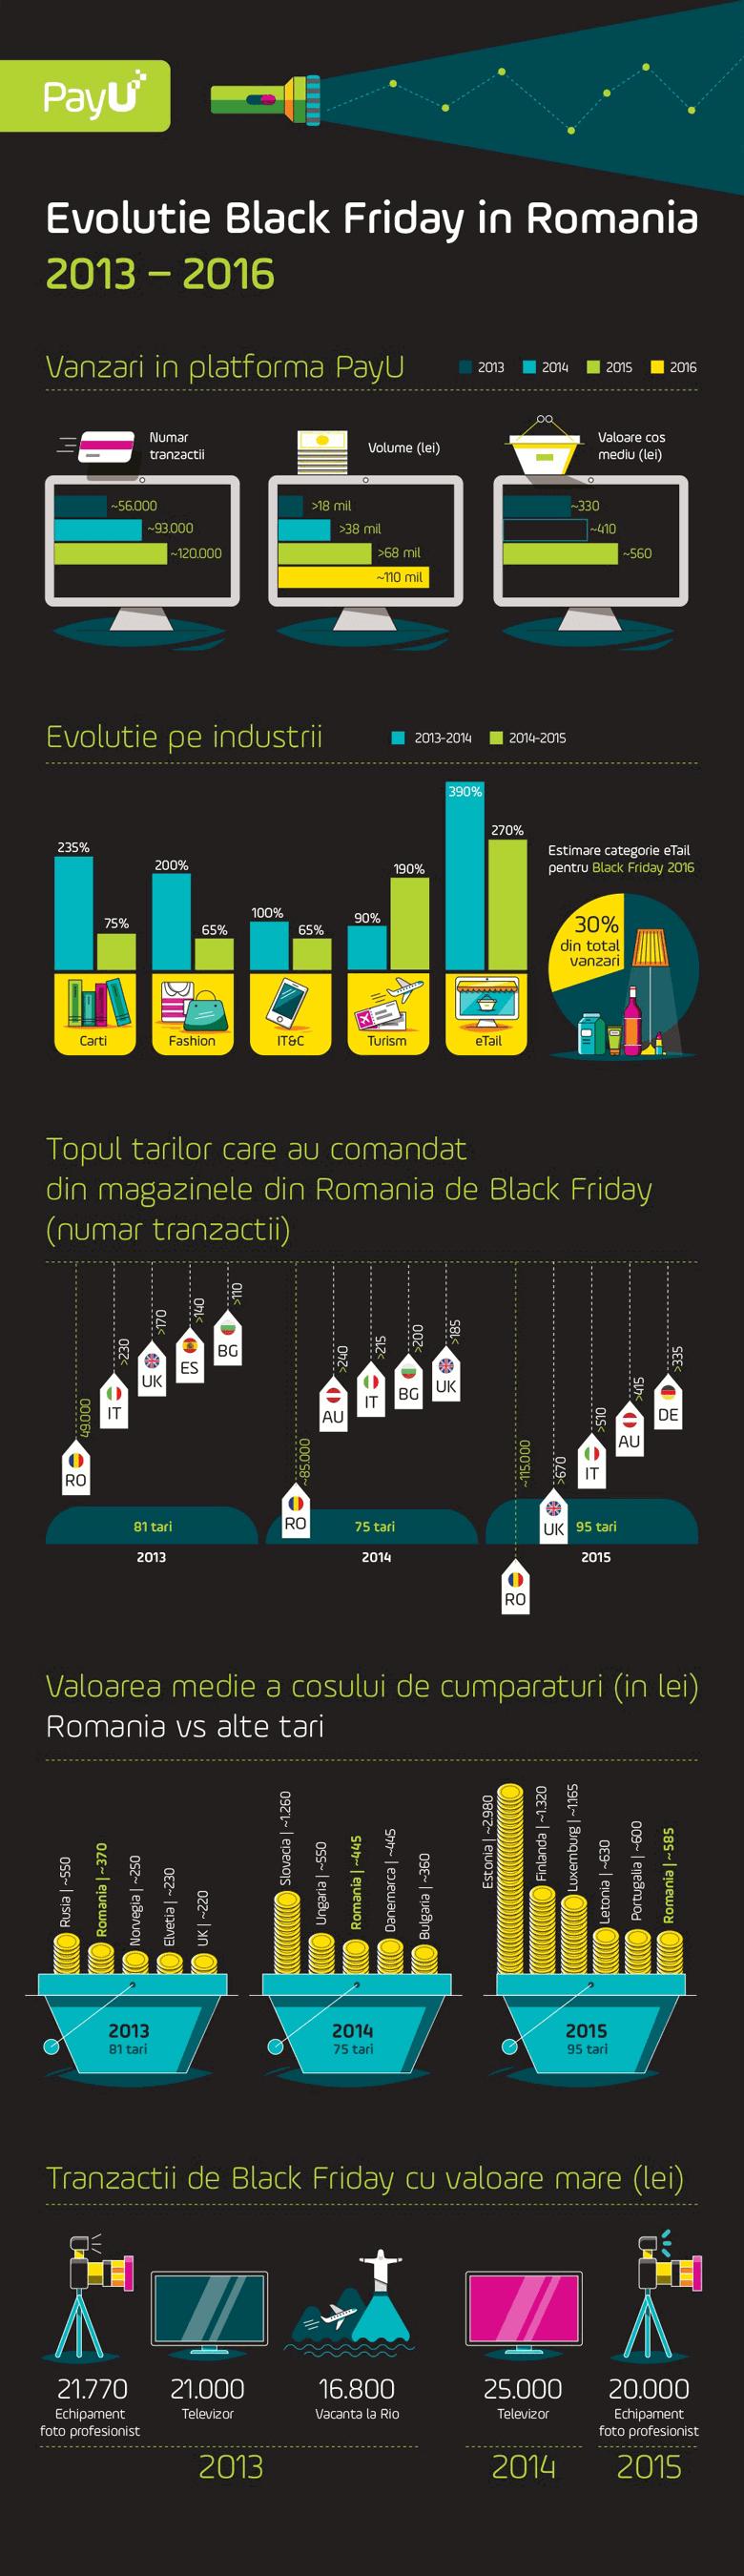 Infografic: Evolutia Black Friday in Romania